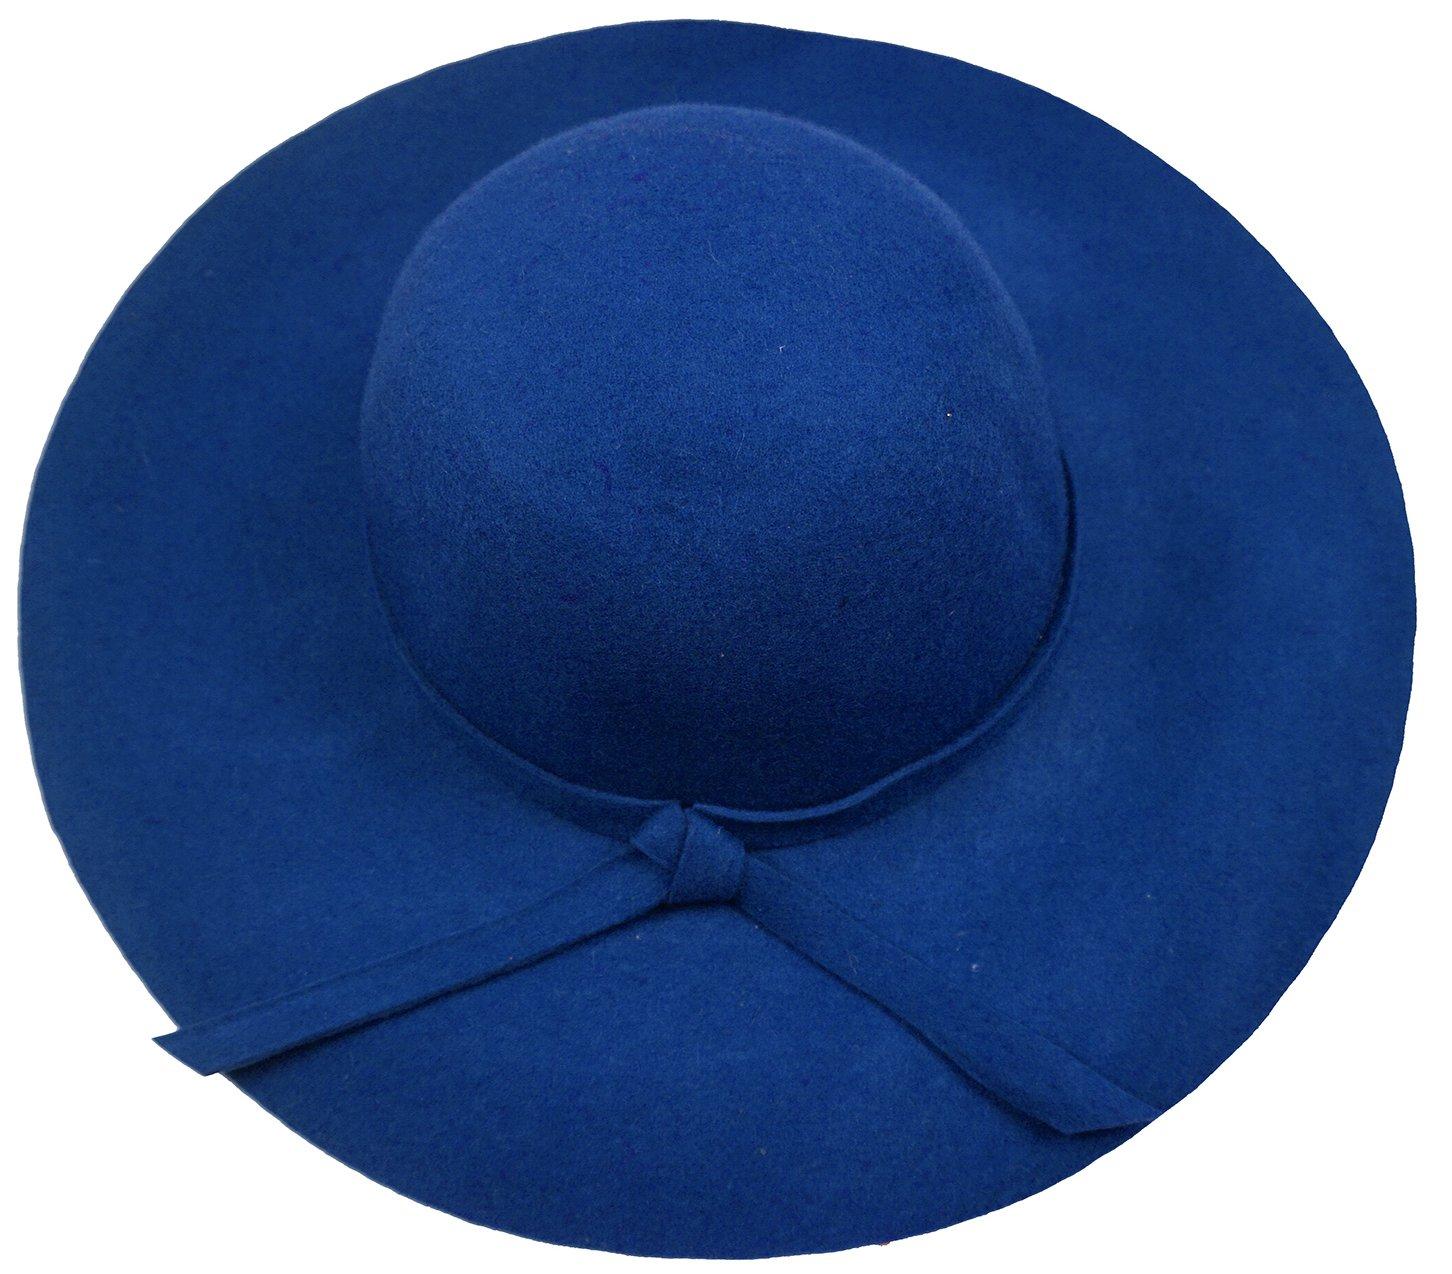 Bienvenu Women's Wide Brim Wool Ribbon Band Floppy Hat